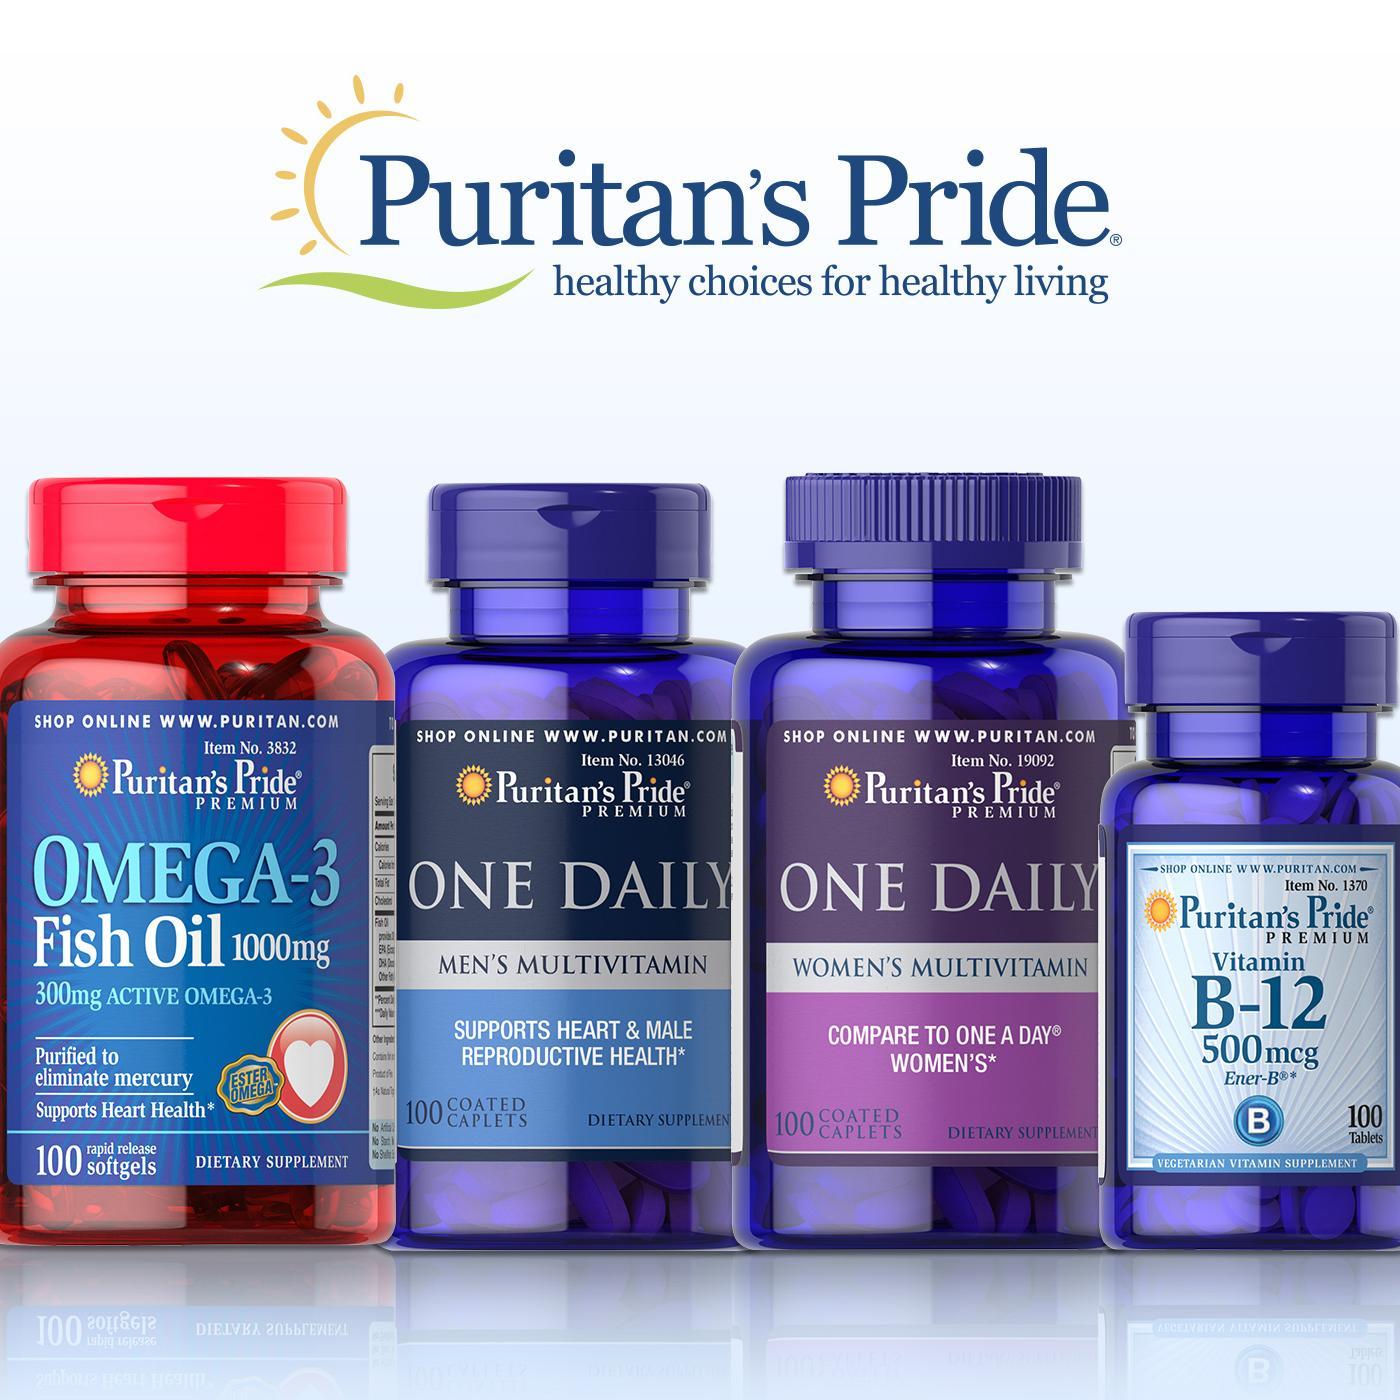 Puritan's Pride 普丽普莱:自营保健品 全系列